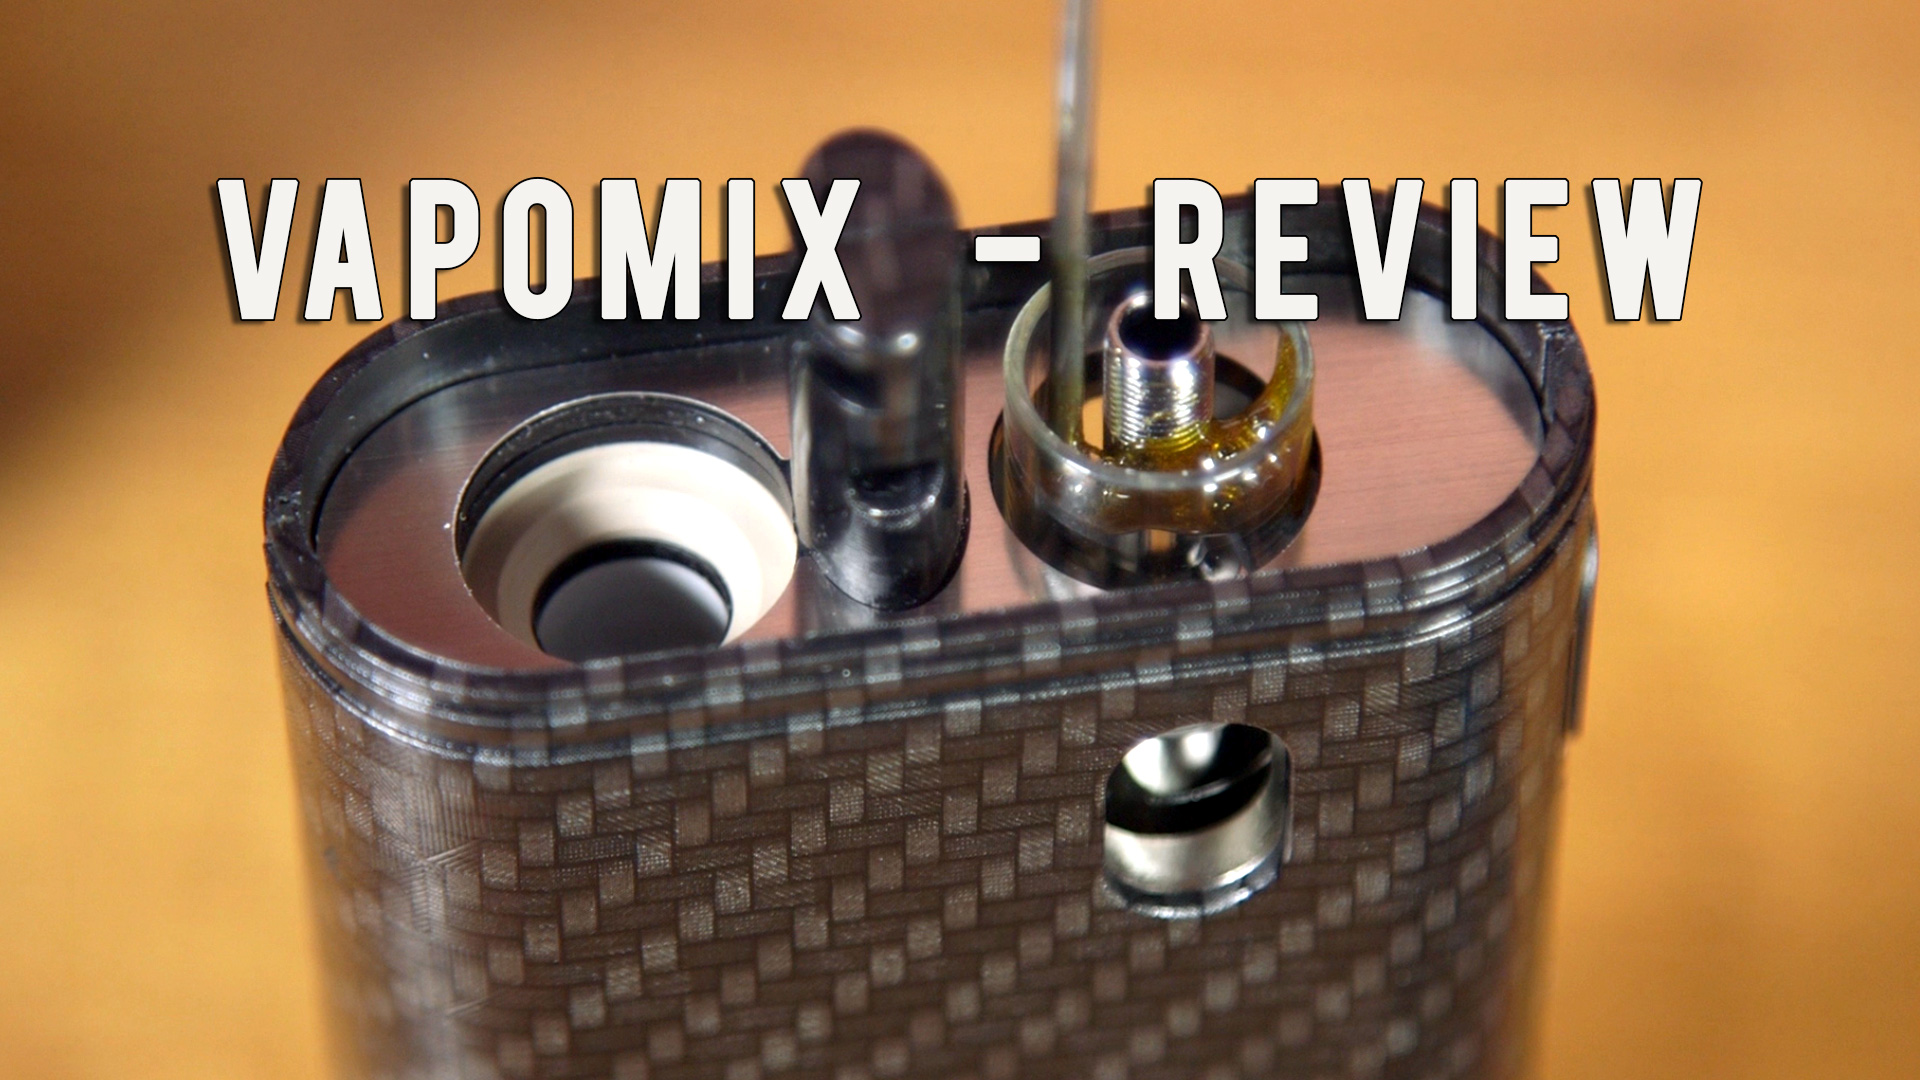 Vapomix-Dual-Dry-Herb-and-eJuice-Vaporizer-Review